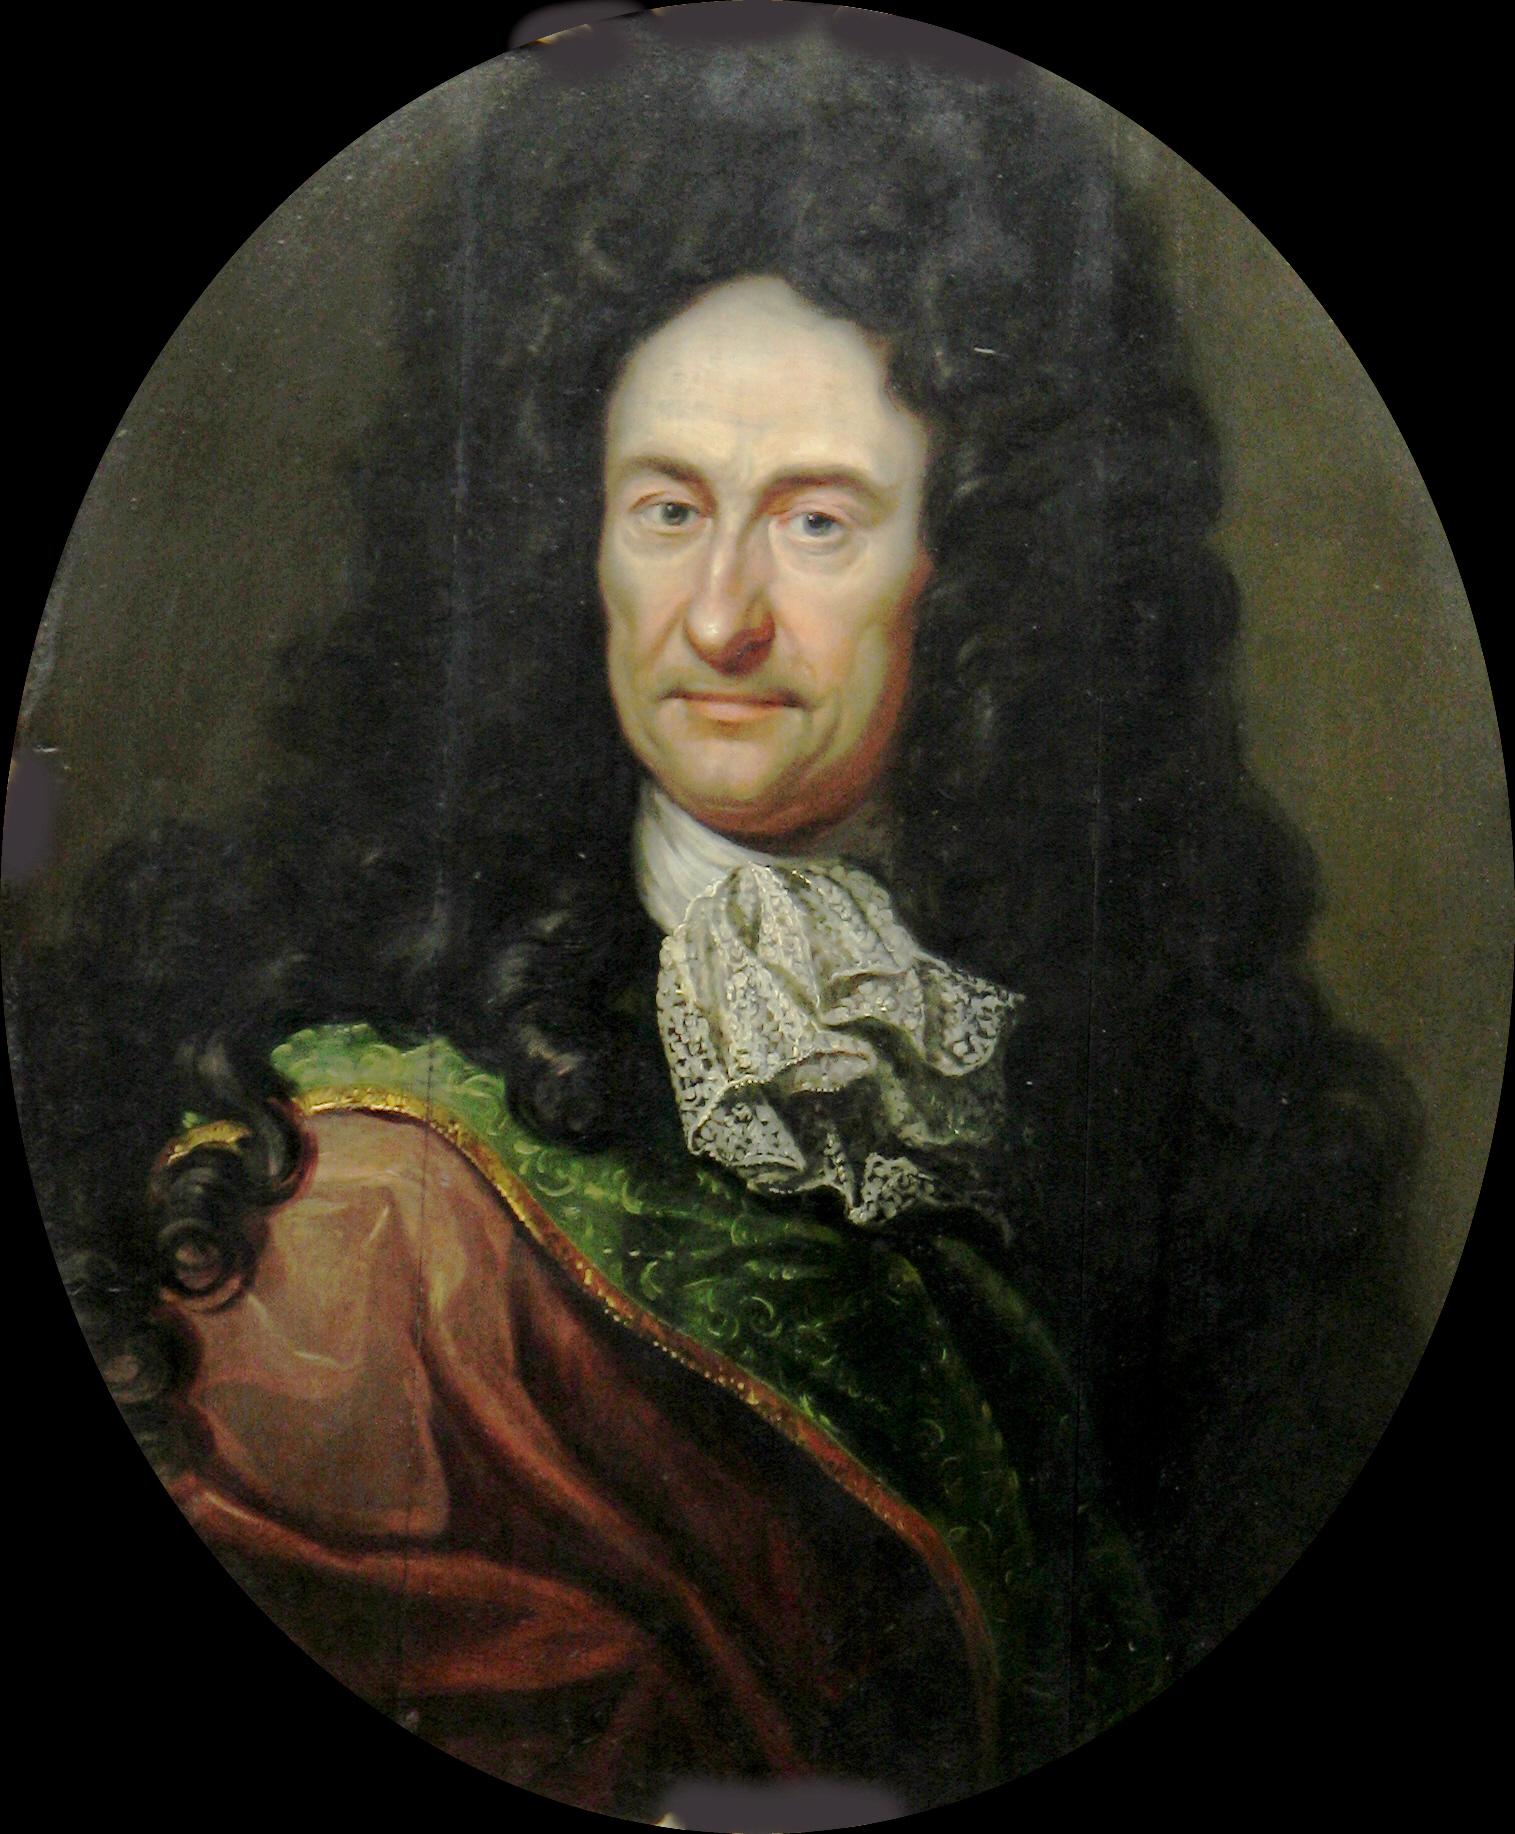 Gottfried_Wilhelm_Leibniz_c1700